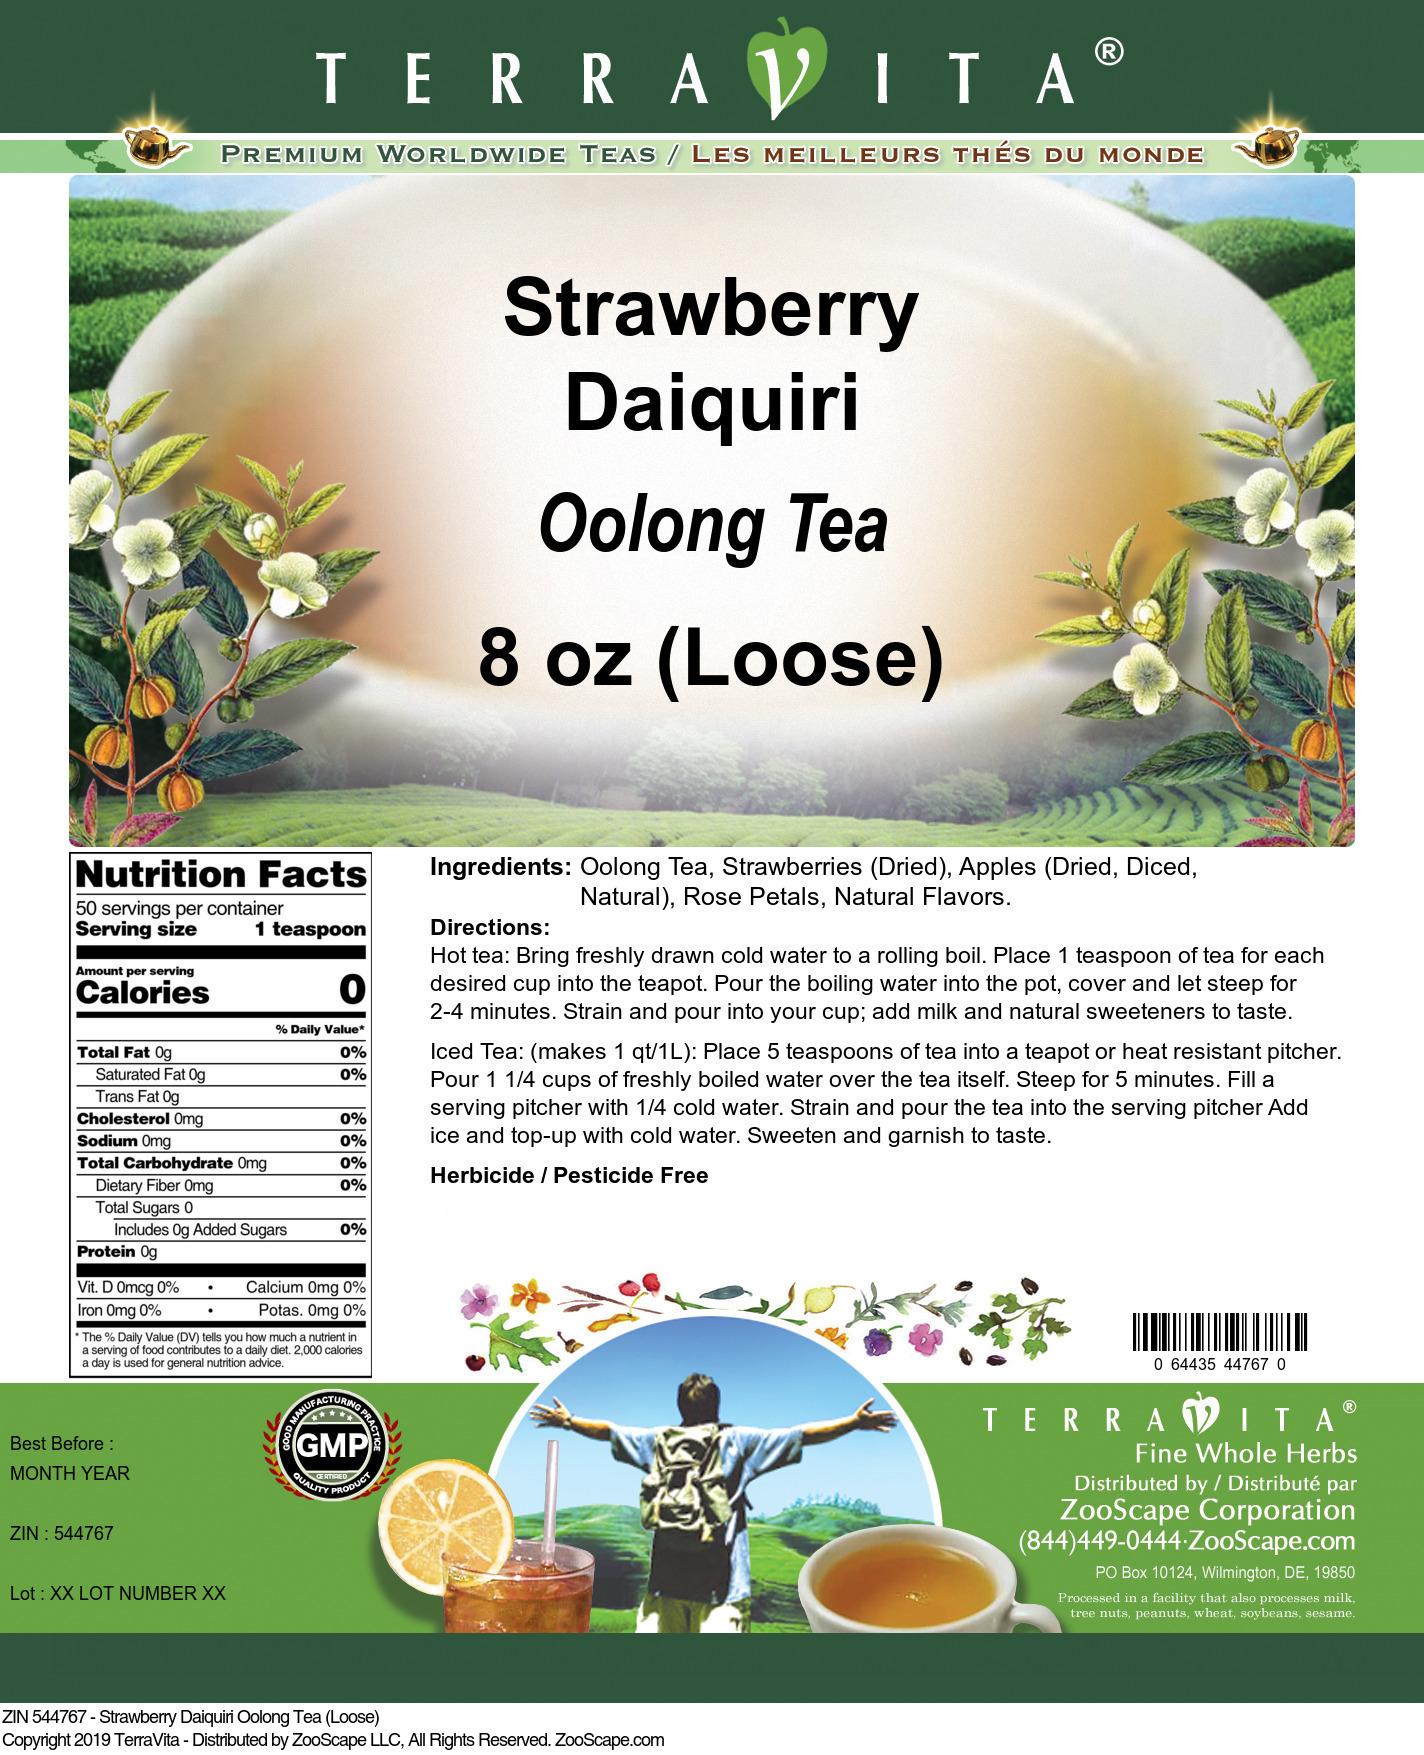 Strawberry Daiquiri Oolong Tea (Loose)